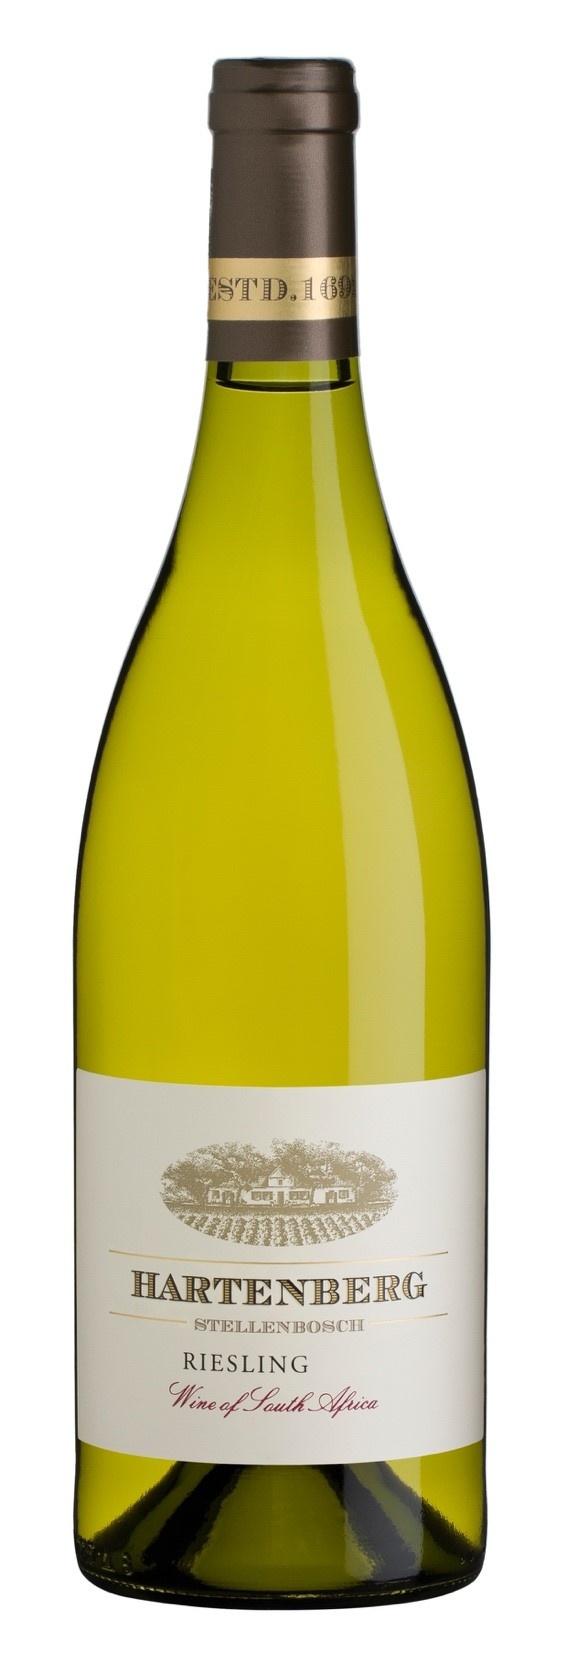 Hartenberg Riesling, 2017, Stellenbosch, Zuid-Afrika, Witte wijn